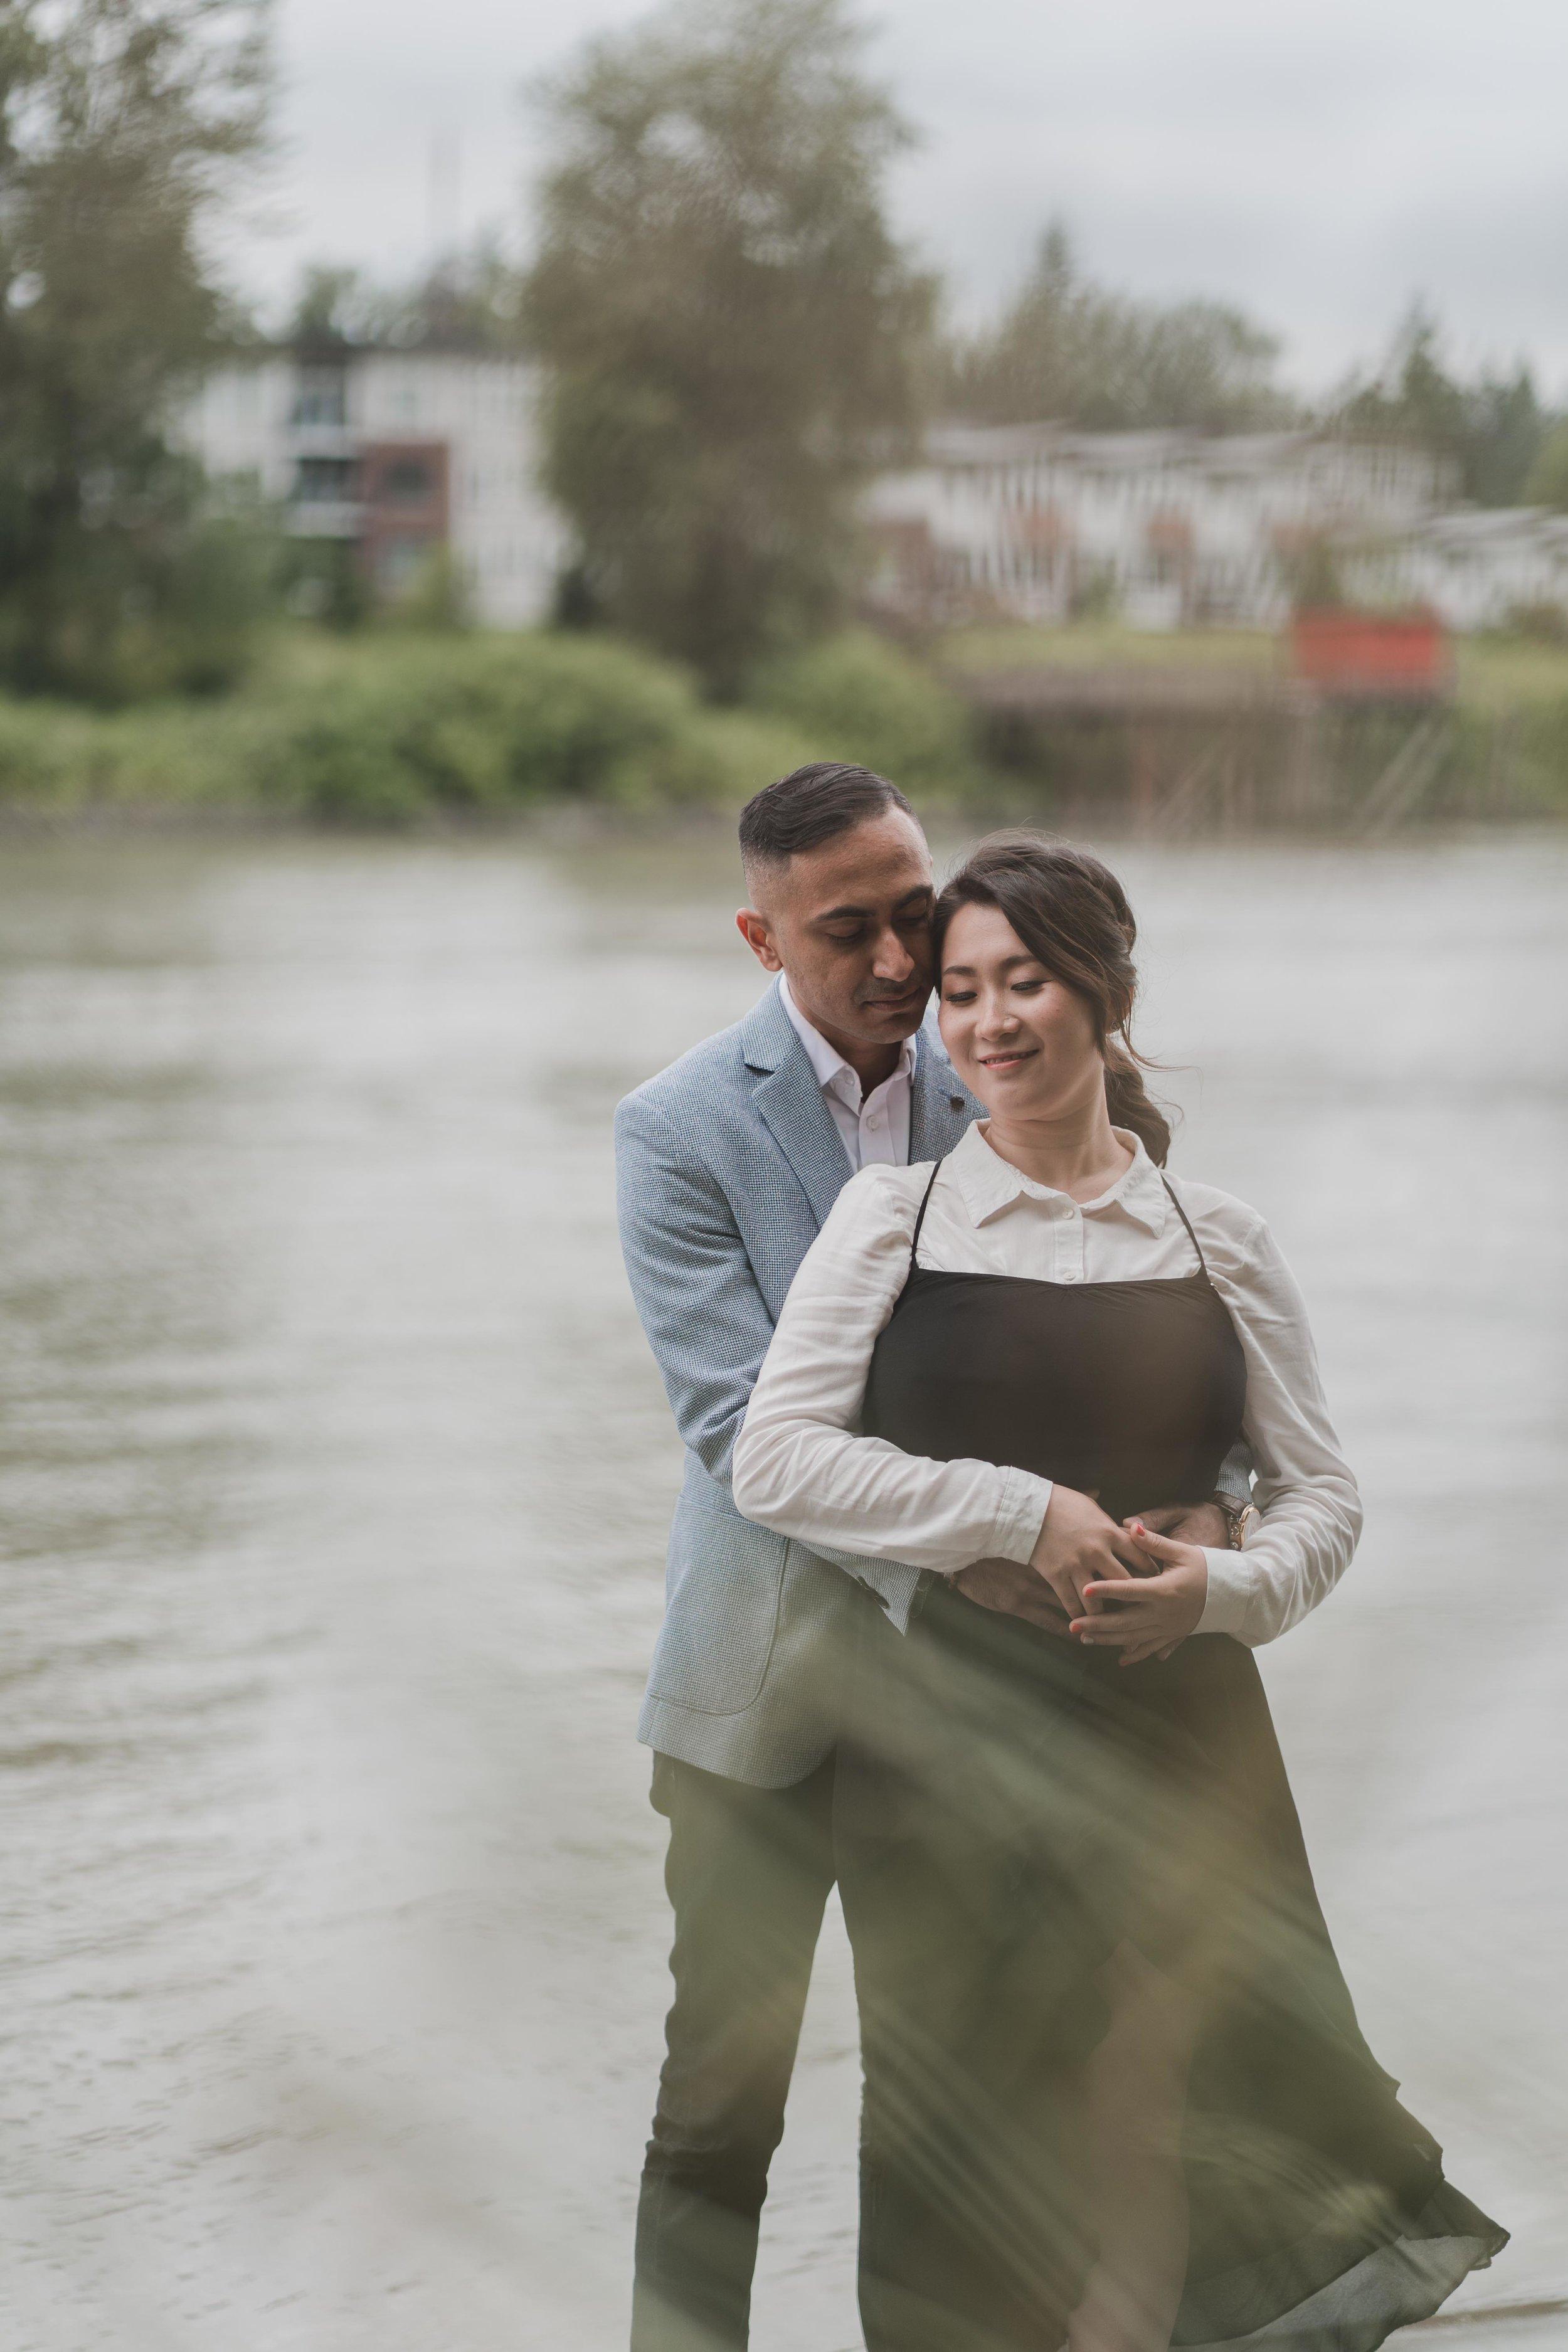 20190622 - Monika & Johnson Engagement - 0108.jpg